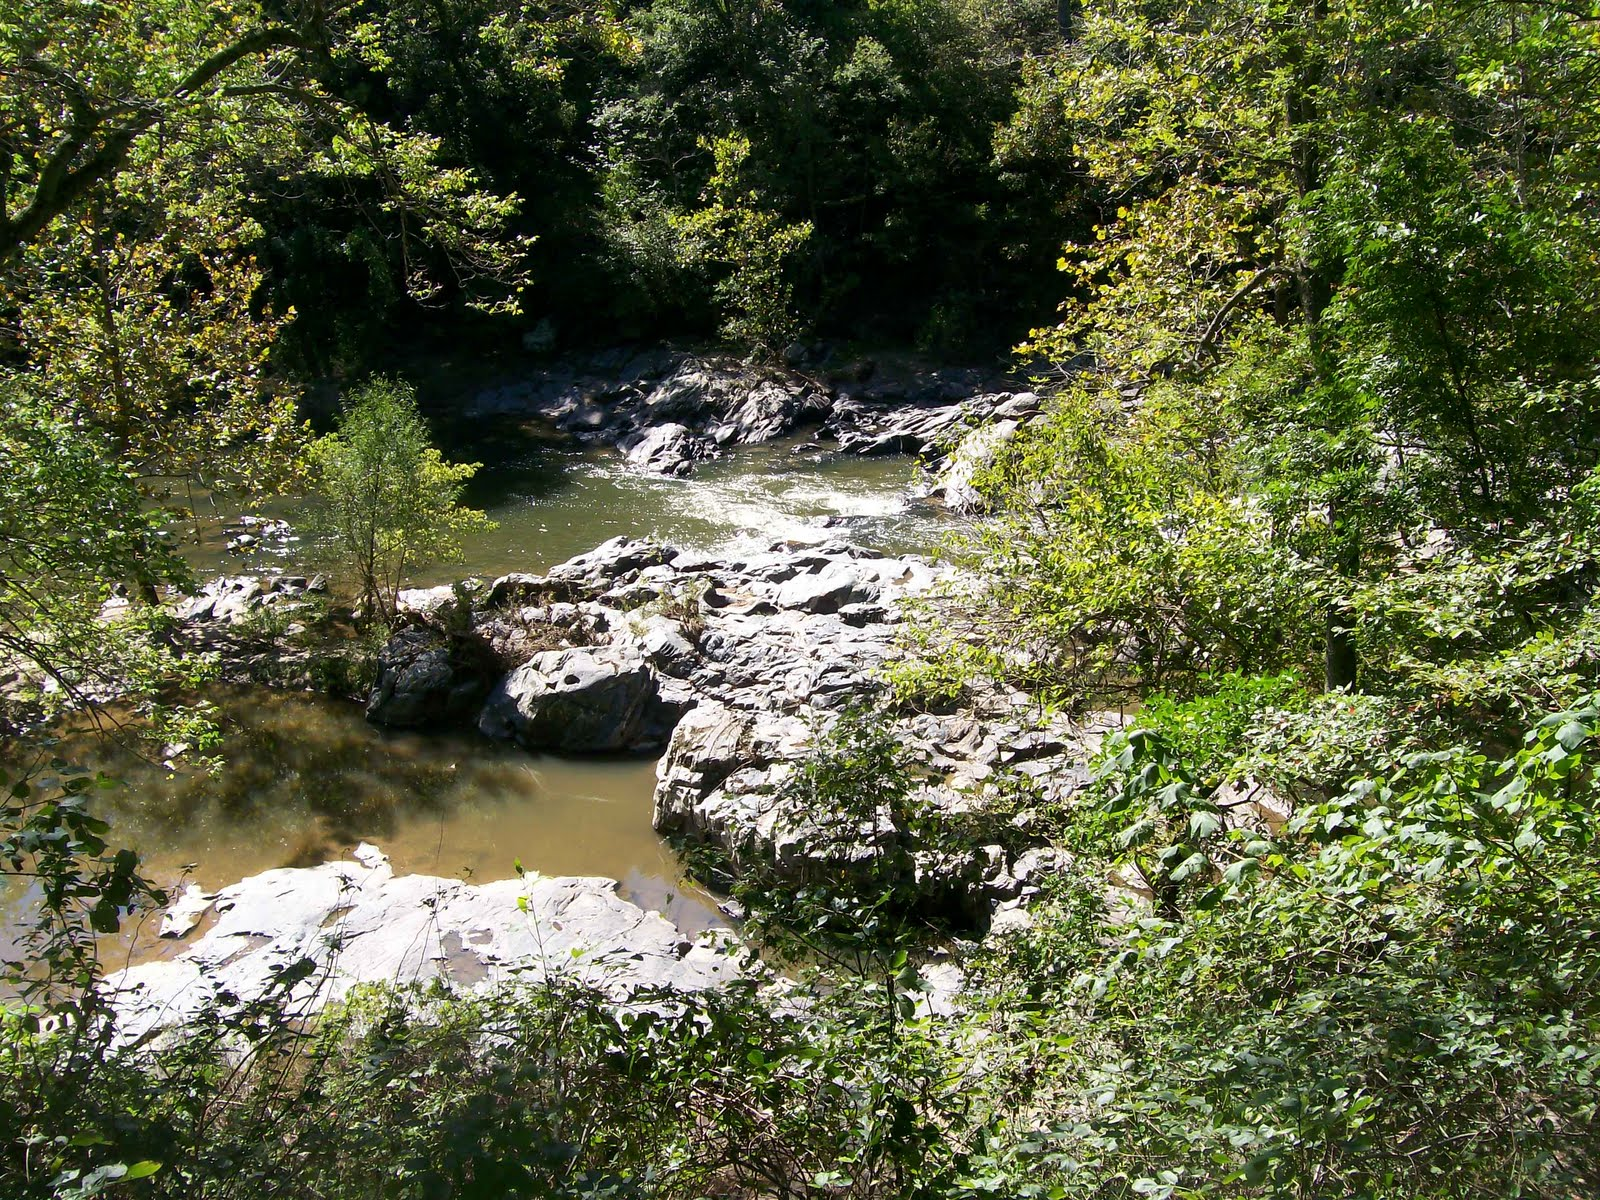 Kaselehlie Hiking At Gunpowder Falls State Park